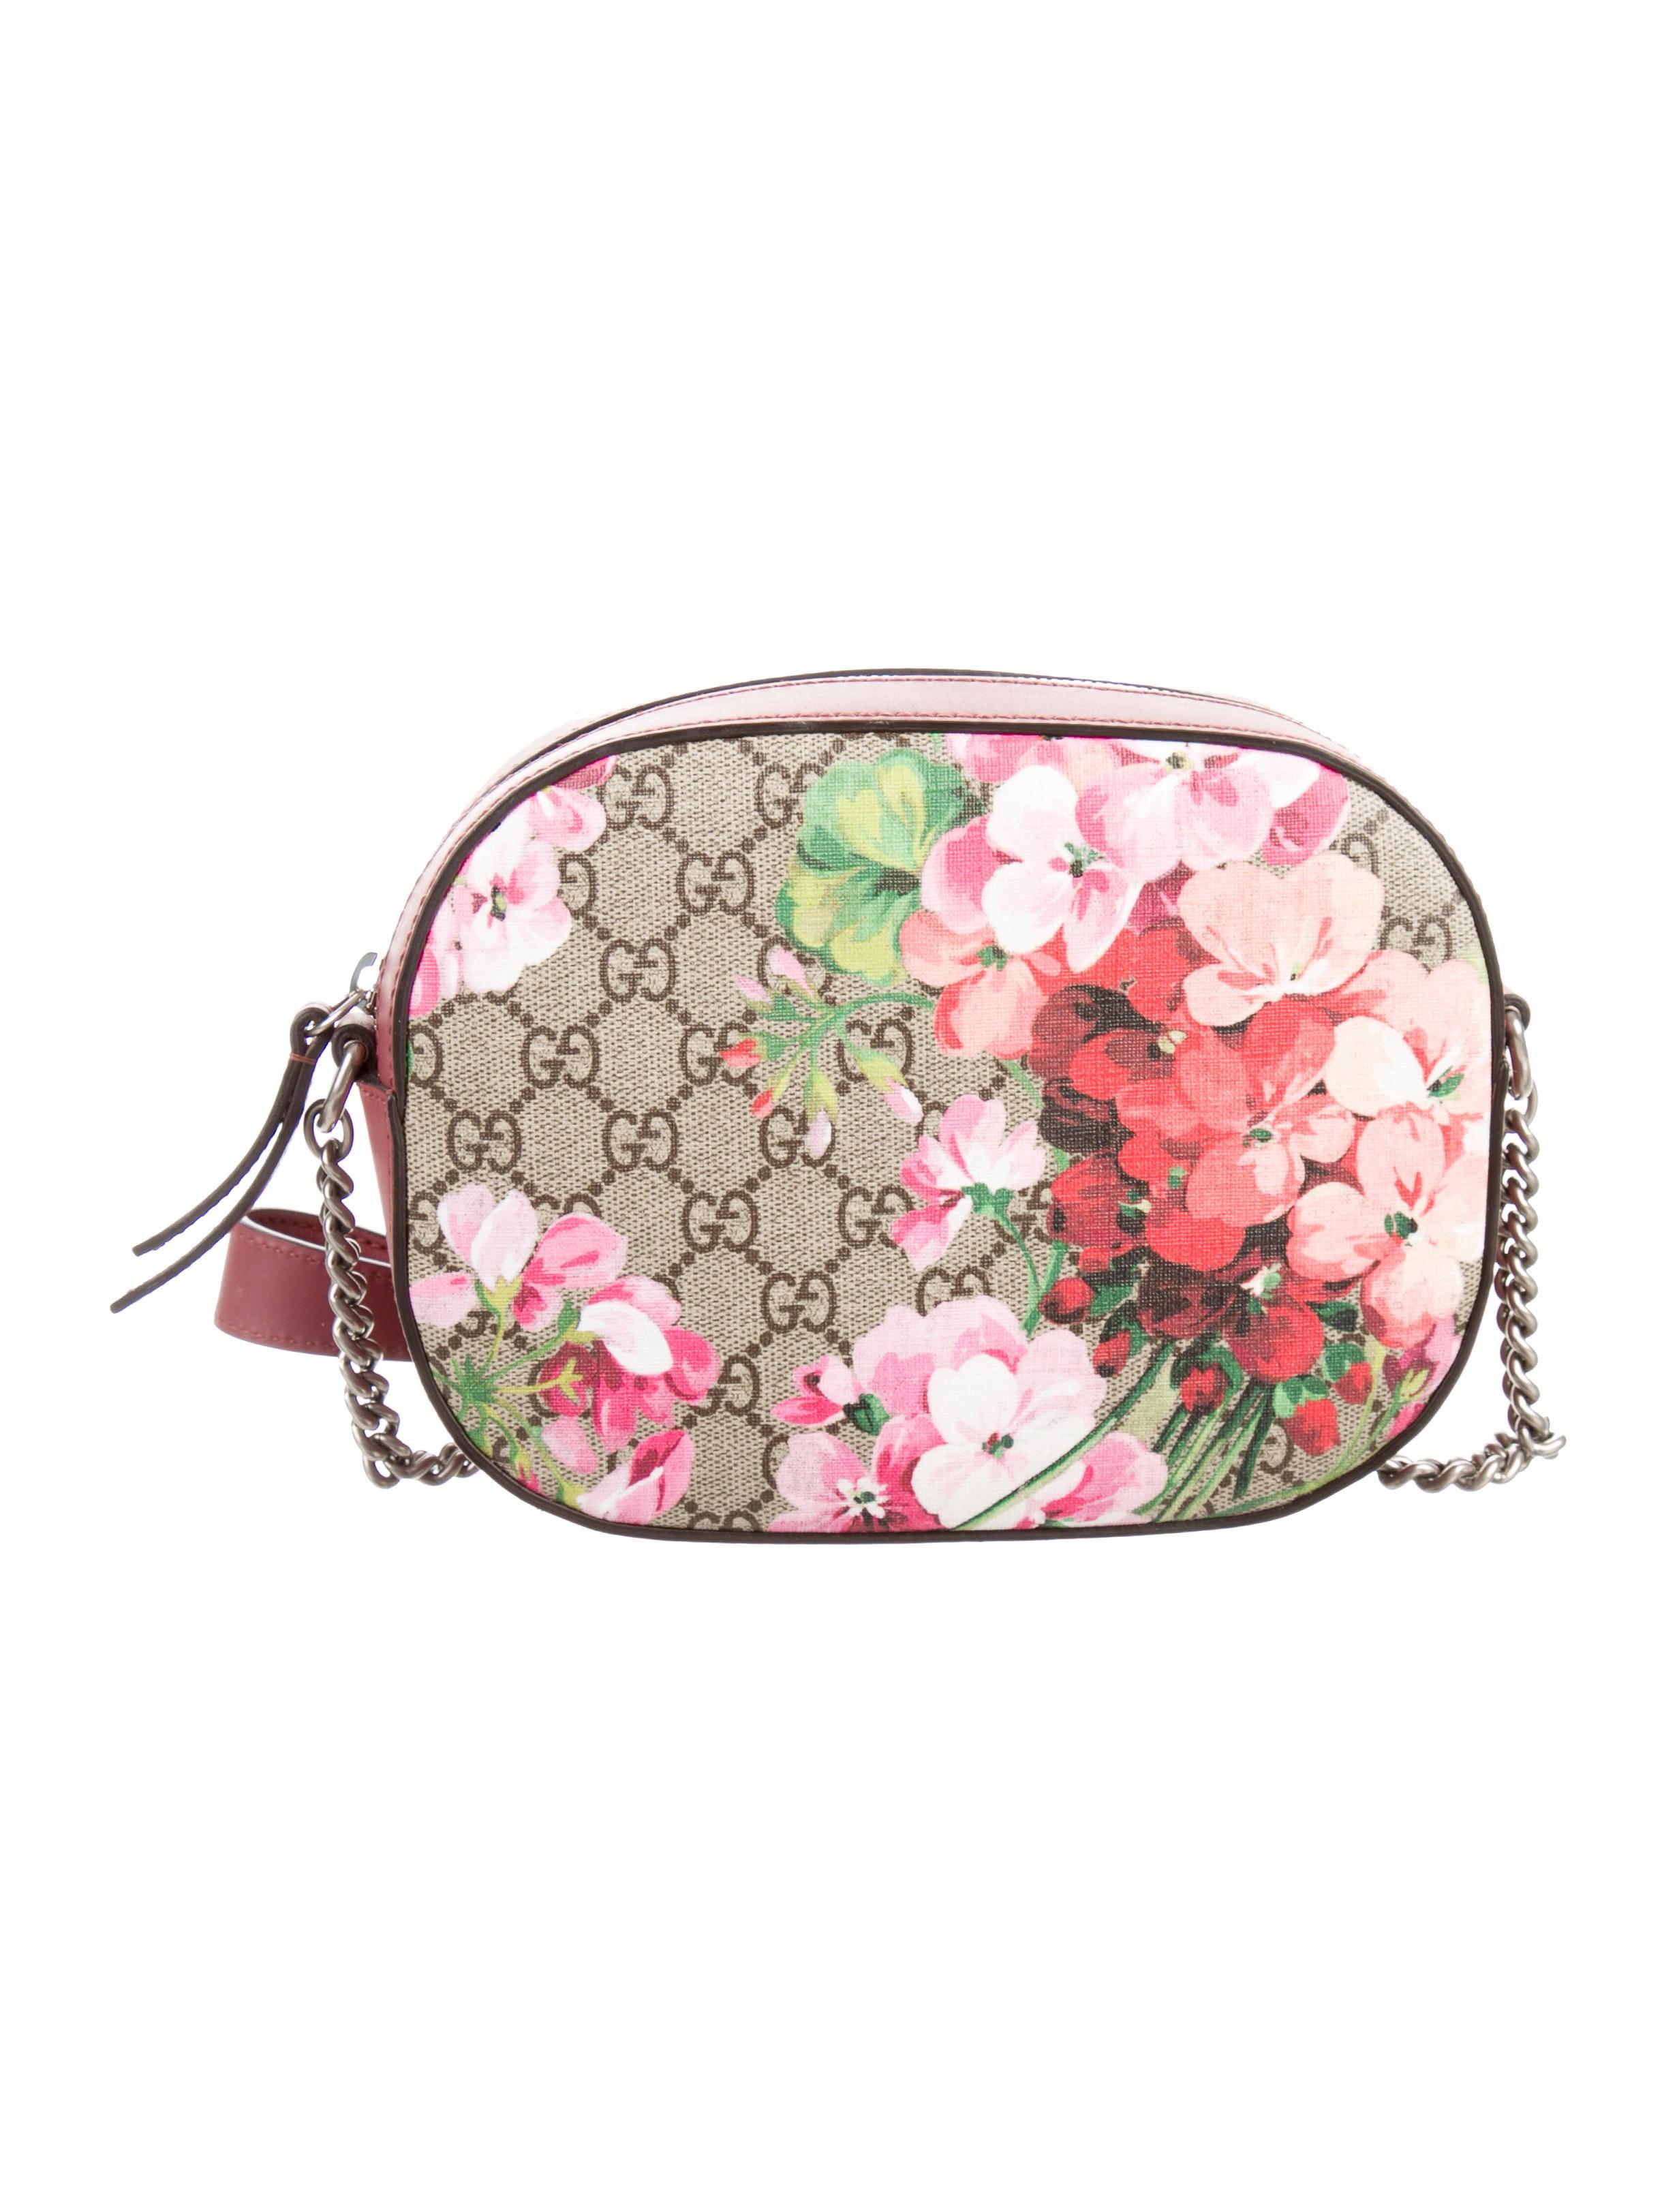 78b8815c071 Gucci Blooms GG Supreme Mini Chain Bag - Handbags - GUC117083